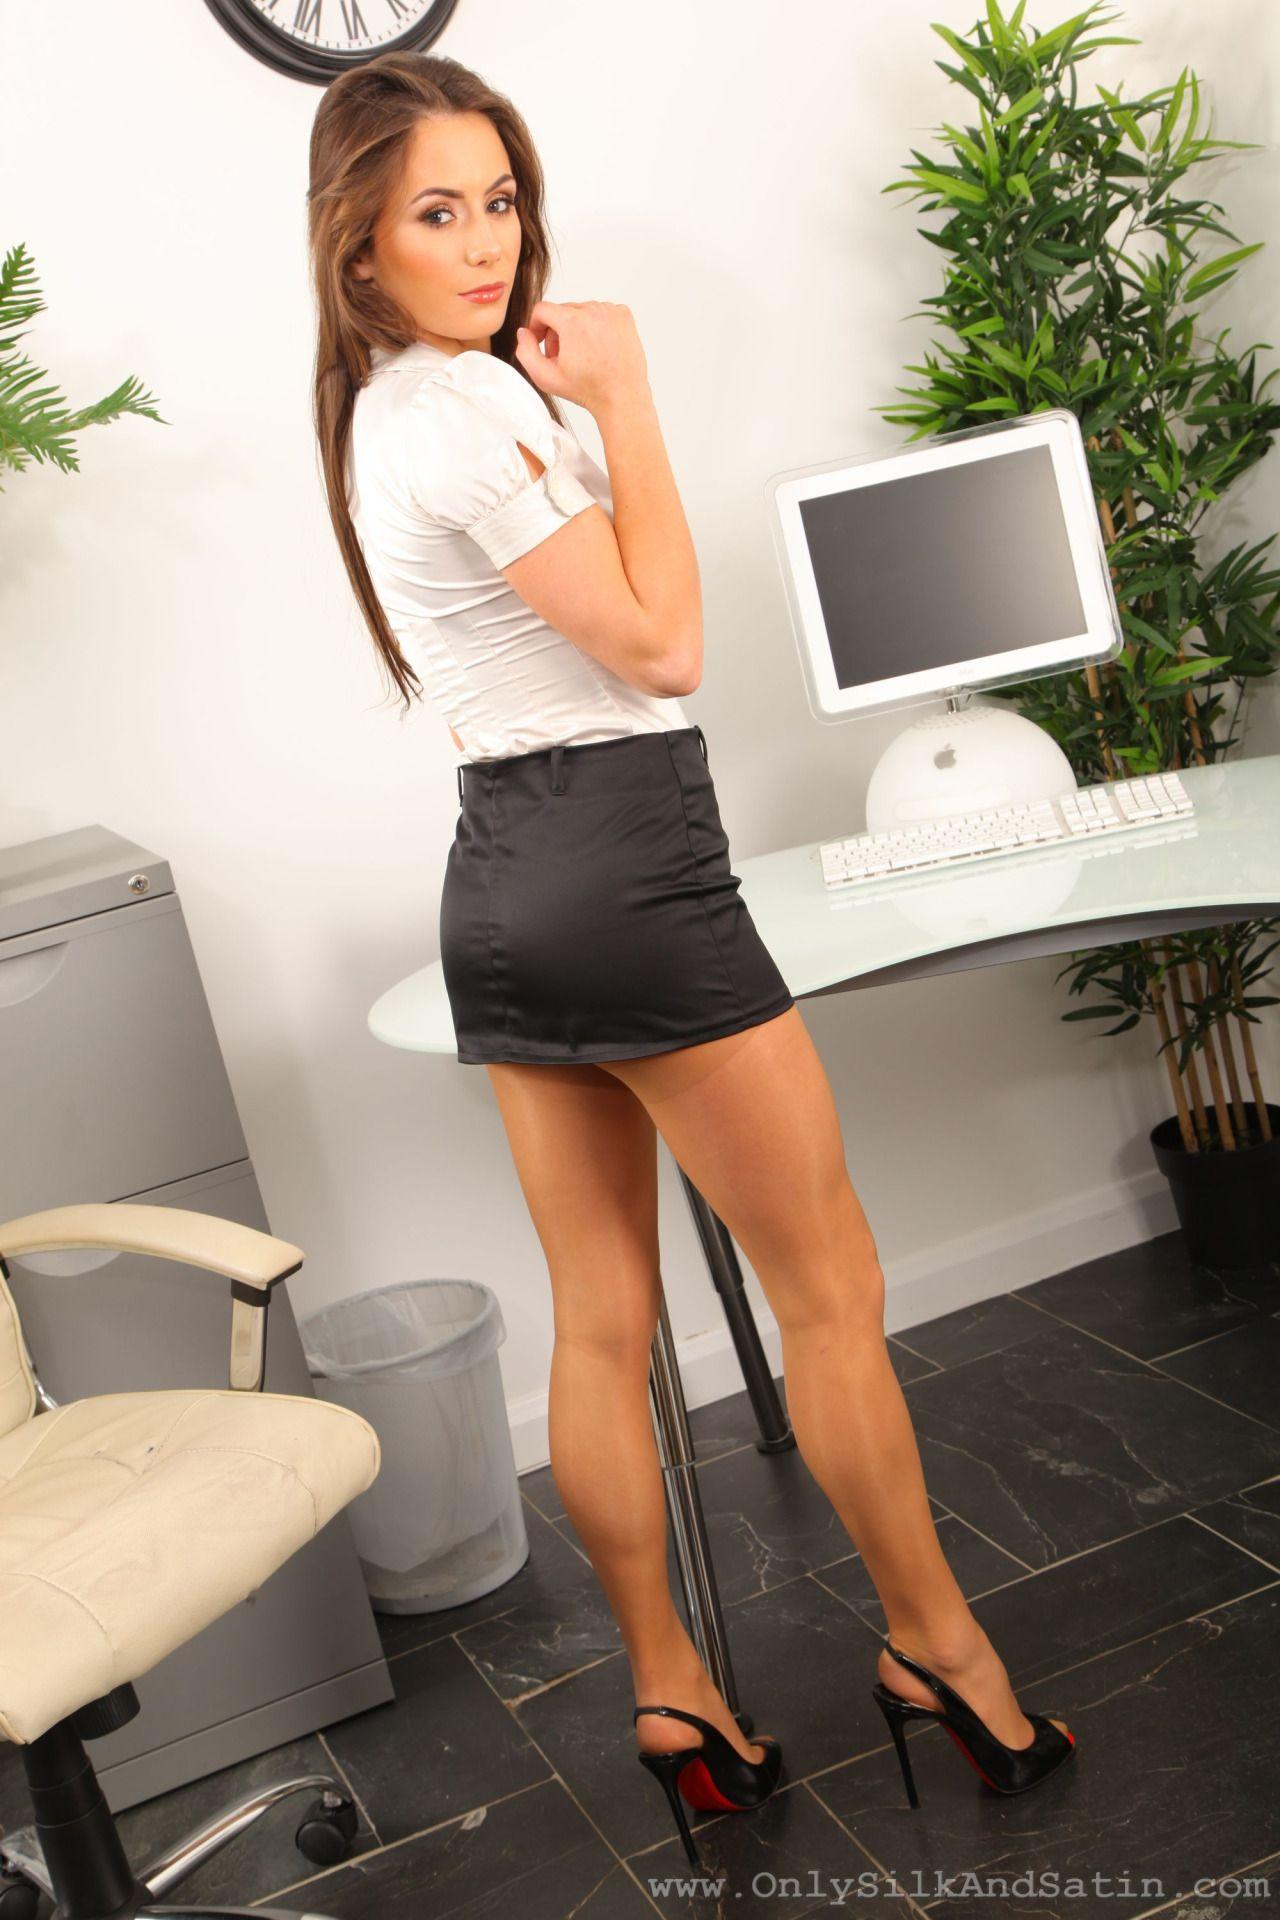 Hot European babe in high-heels Cipriana masturbates gracefully № 672528  скачать